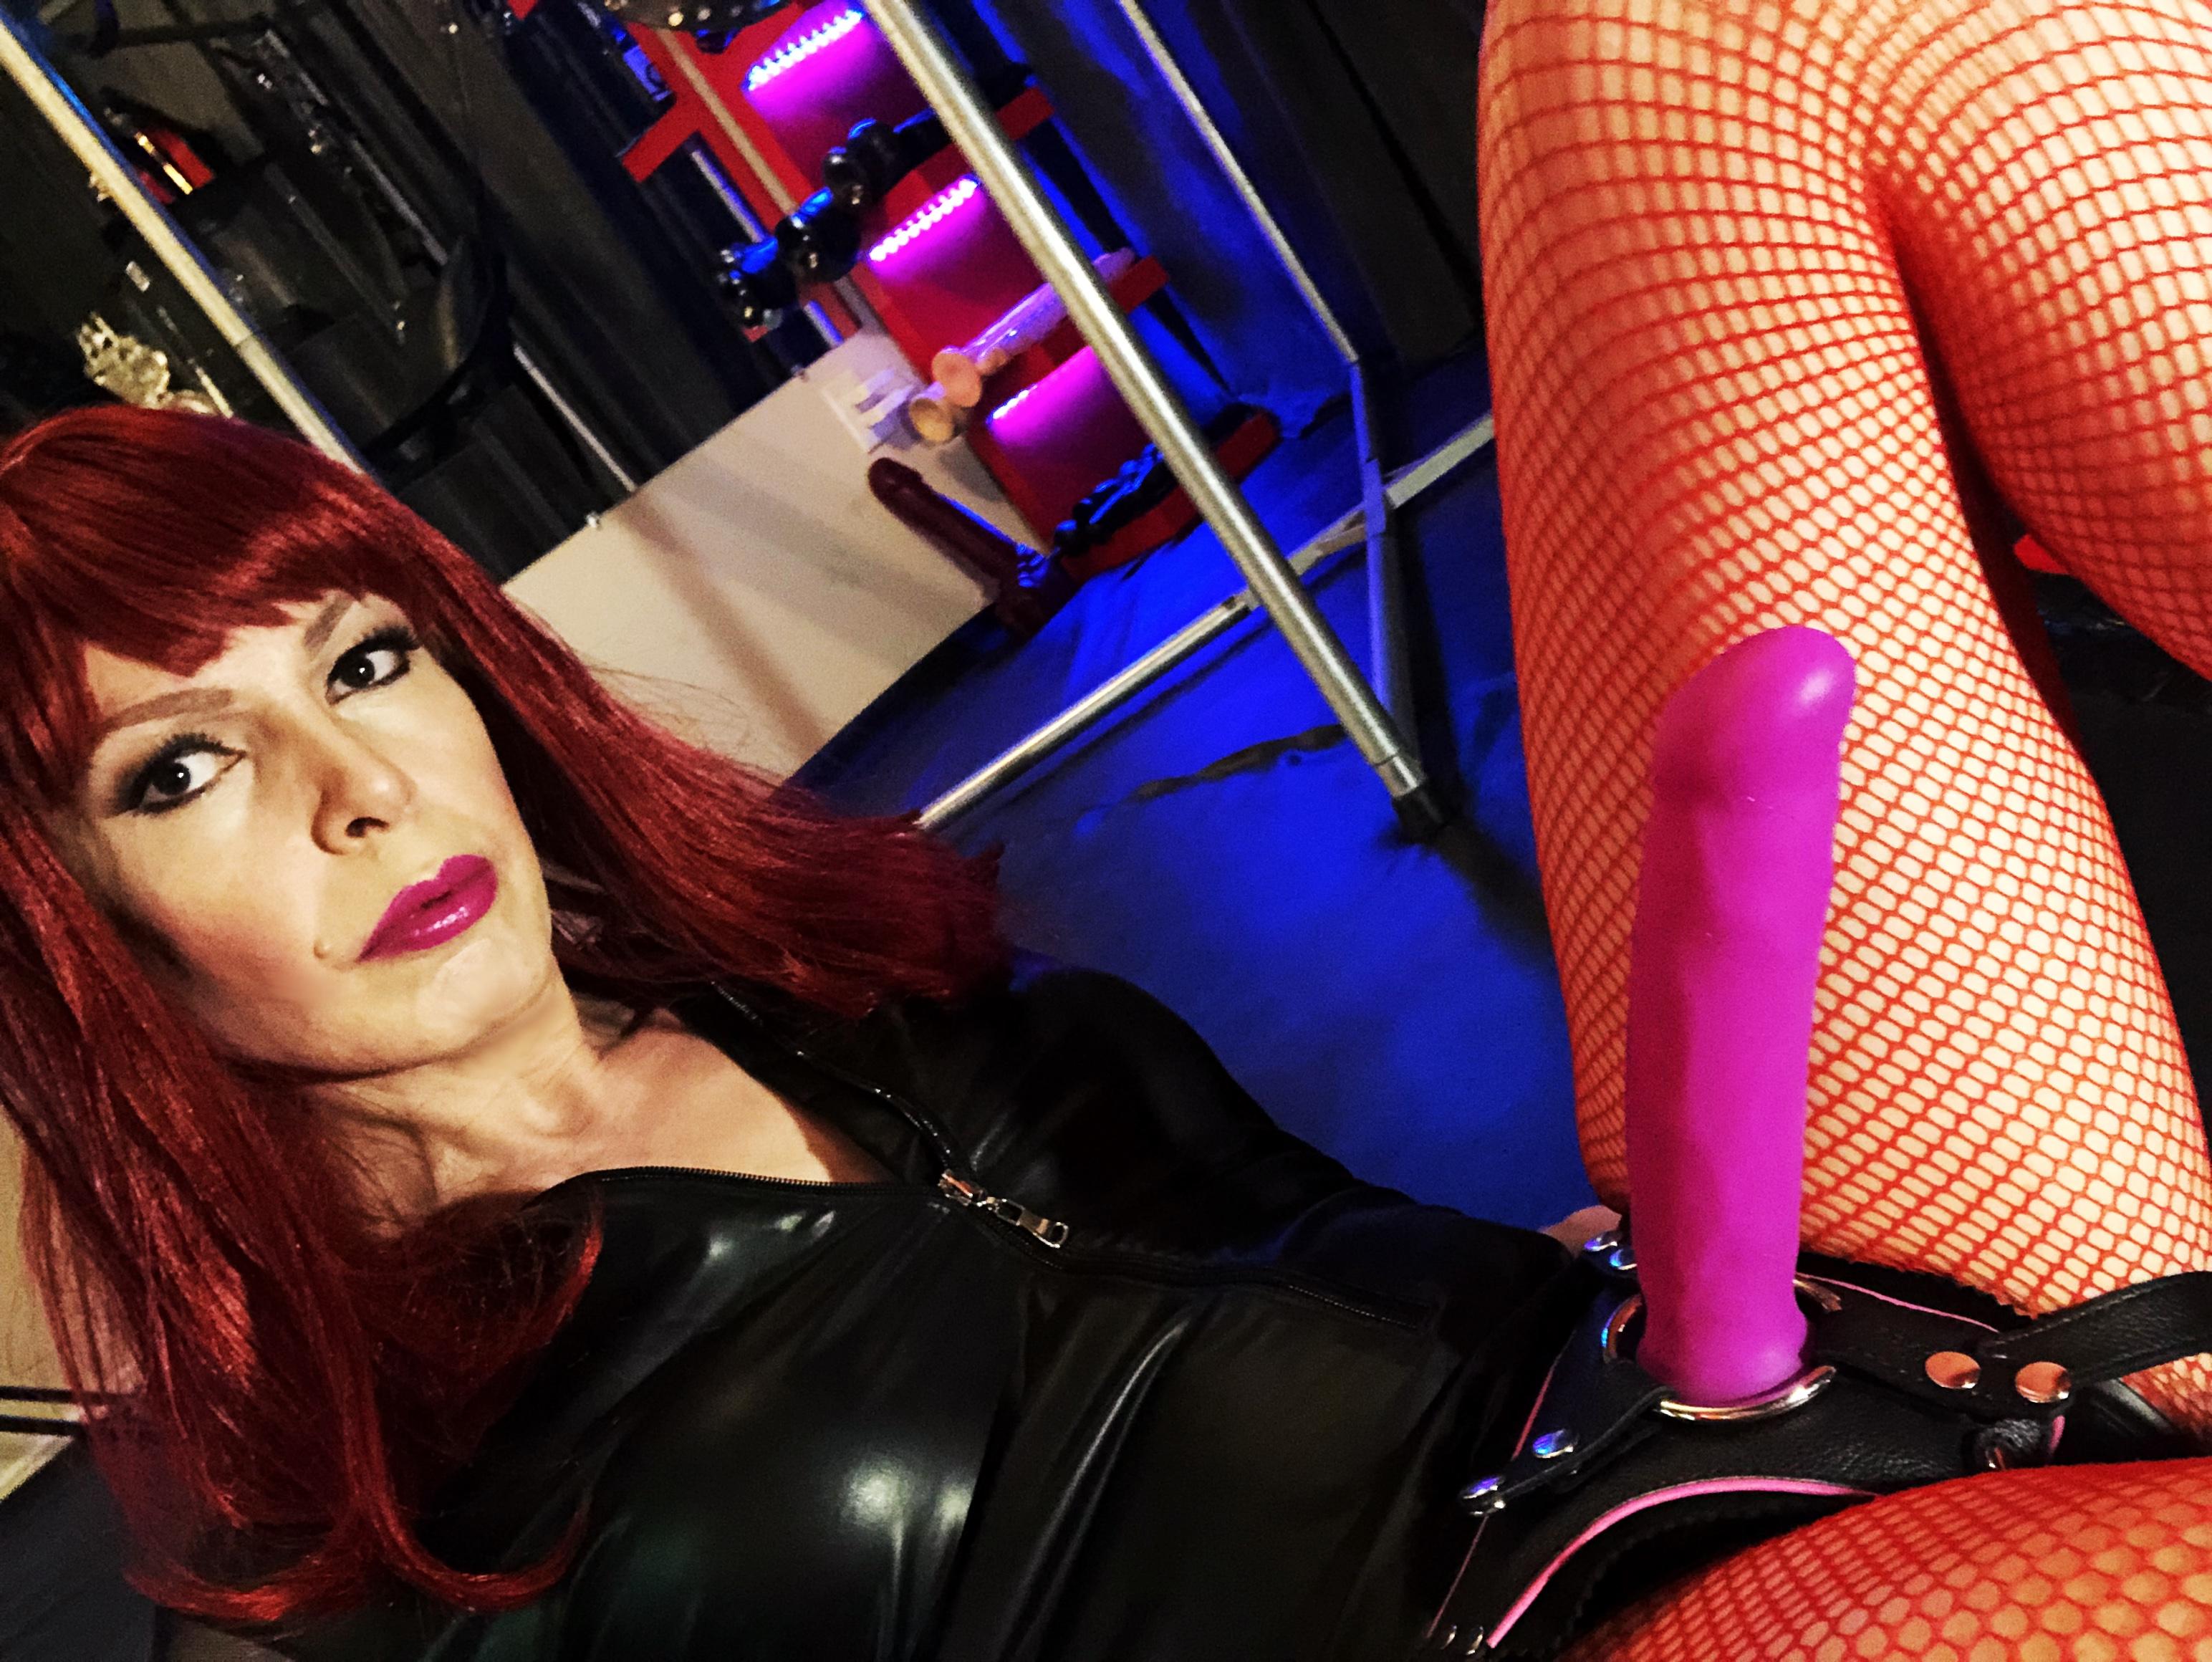 TS Mistress Vivian